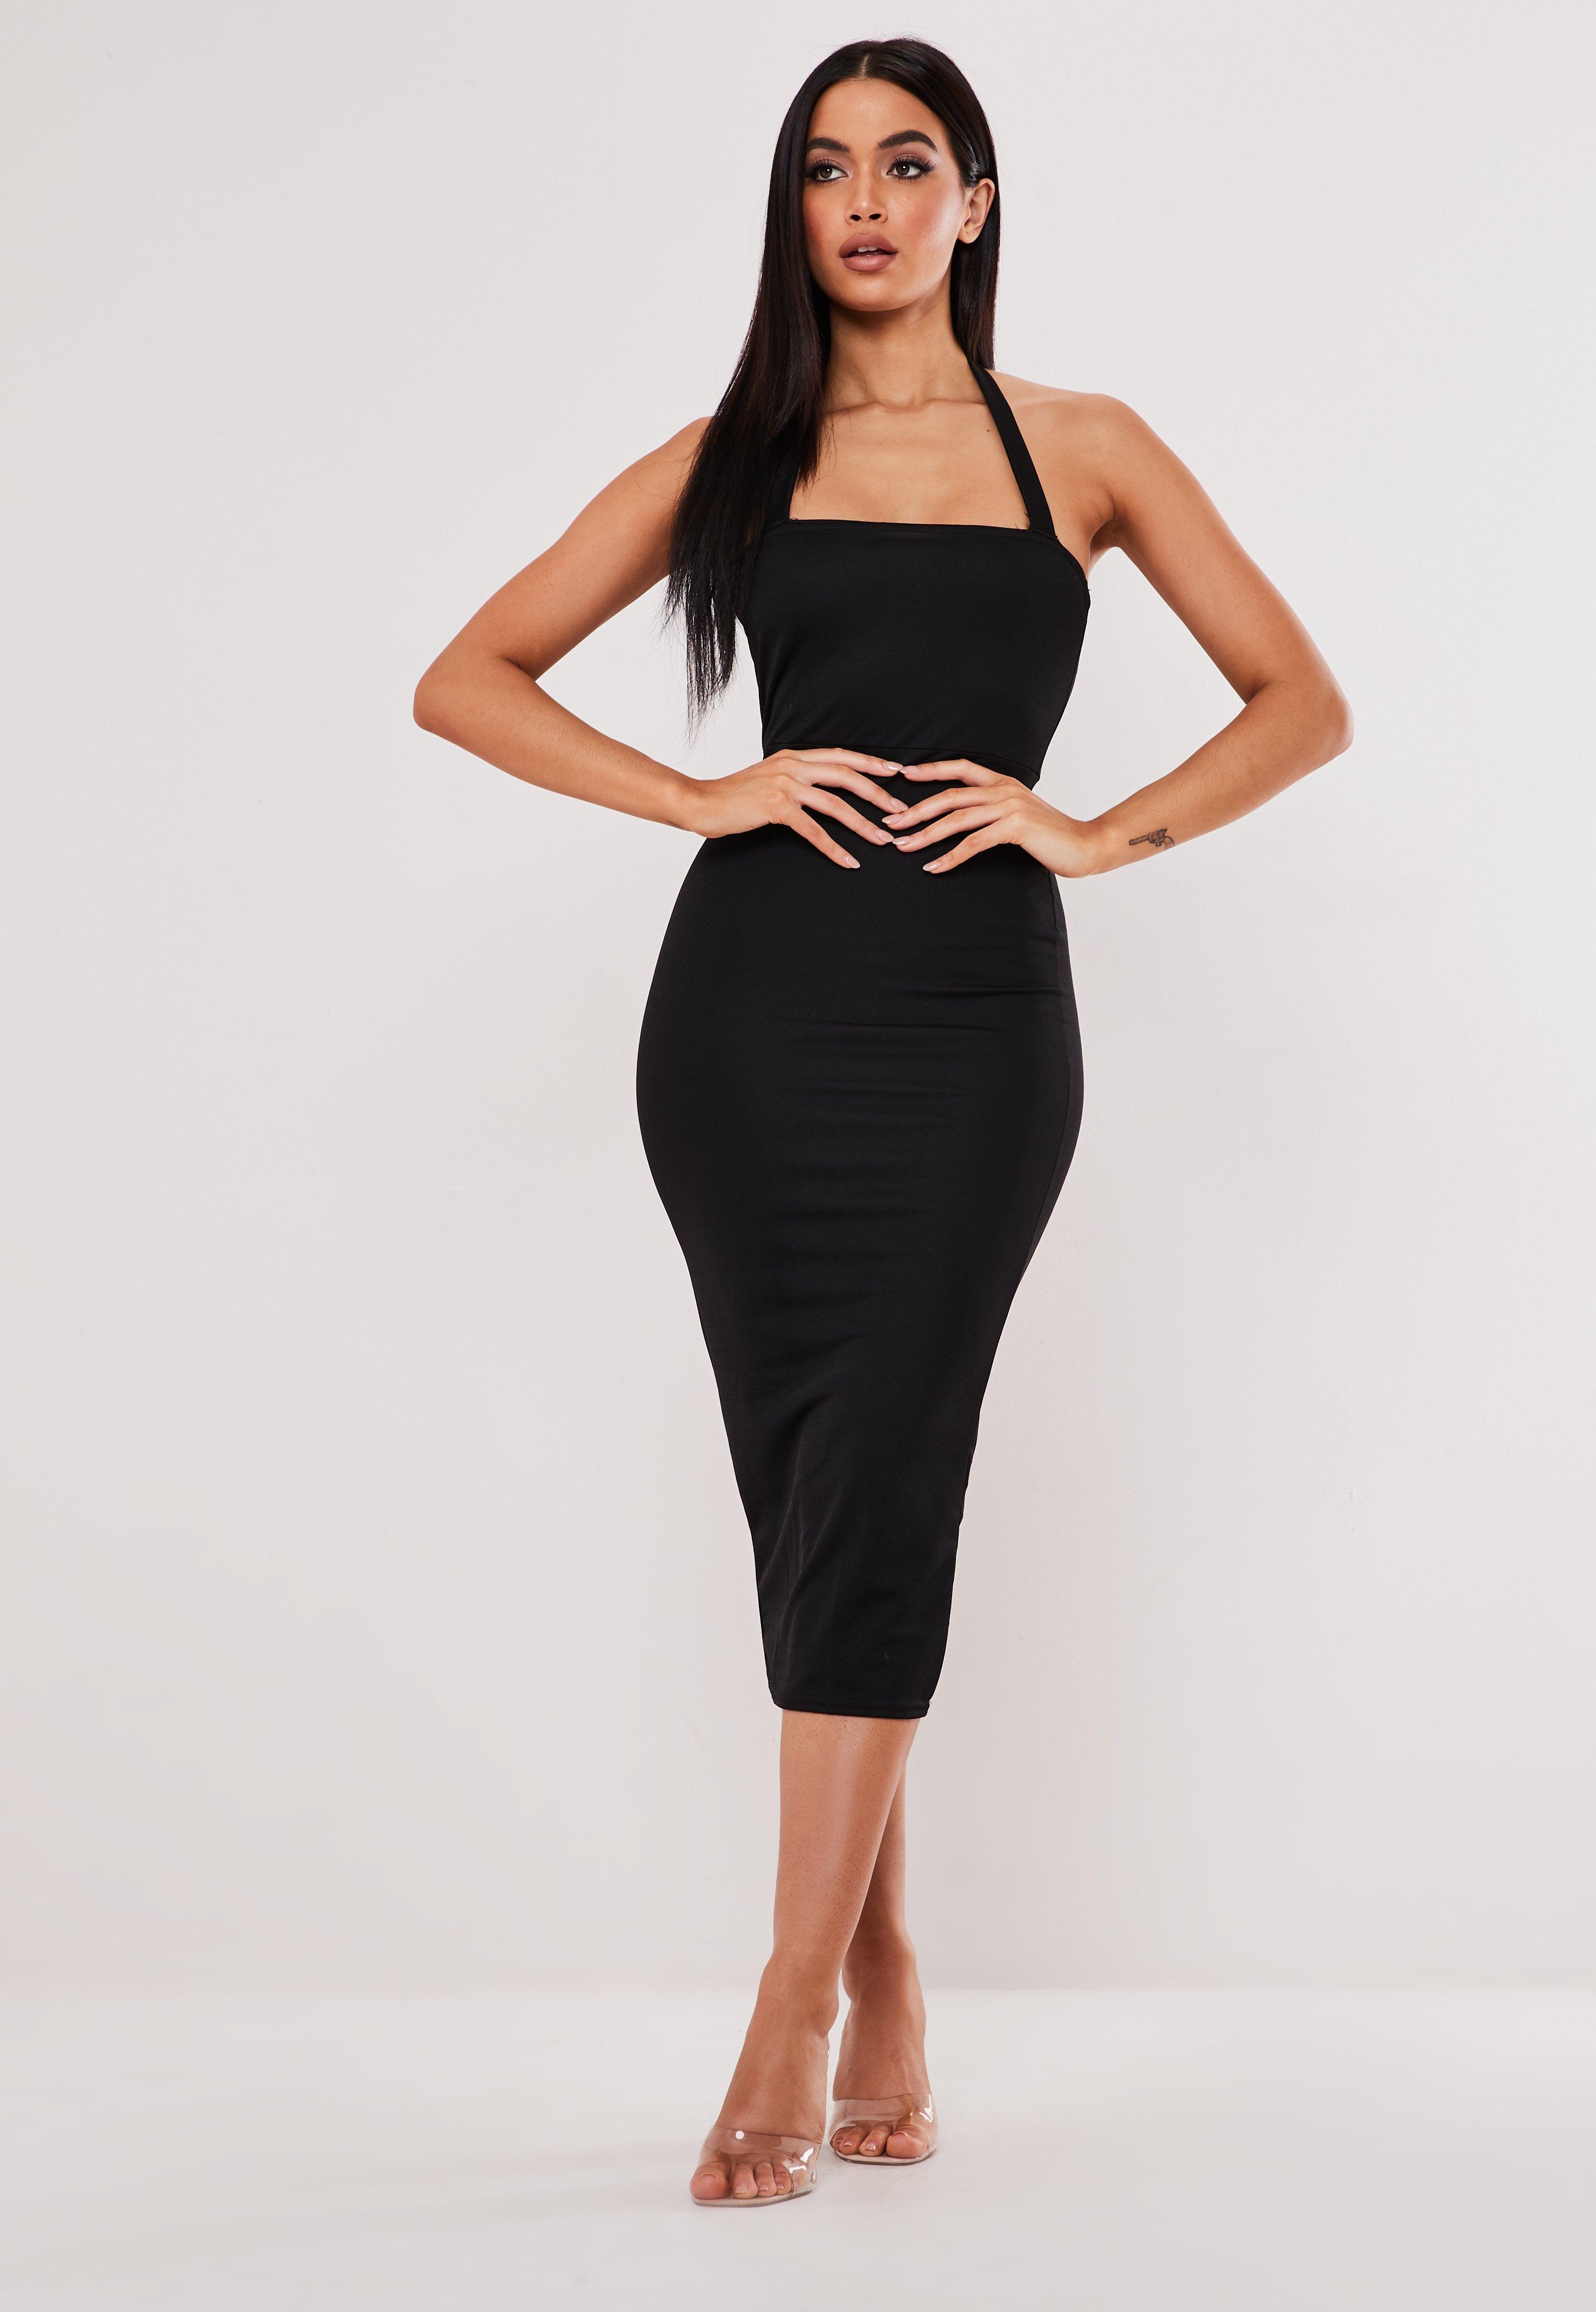 c2a8d19b0a Bodycon Dresses